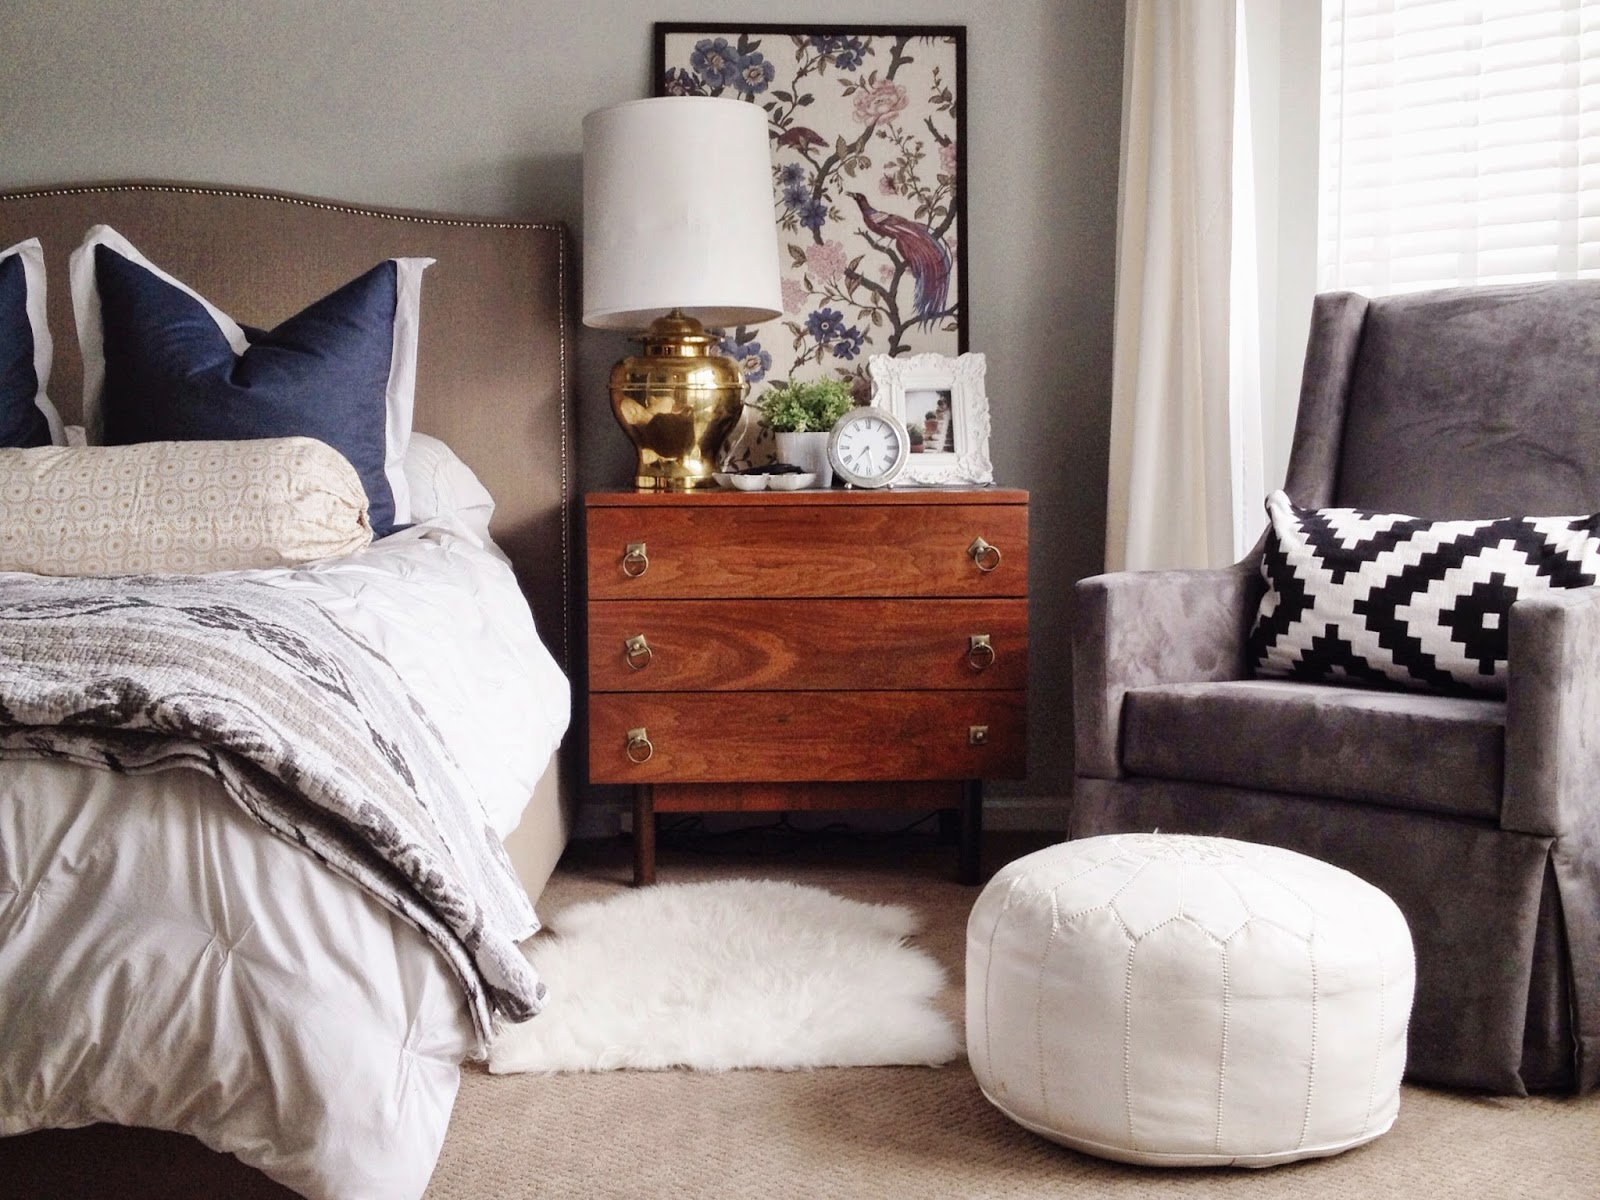 Master Bedroom 2014 nuestra vida dulce: master bedroom changes